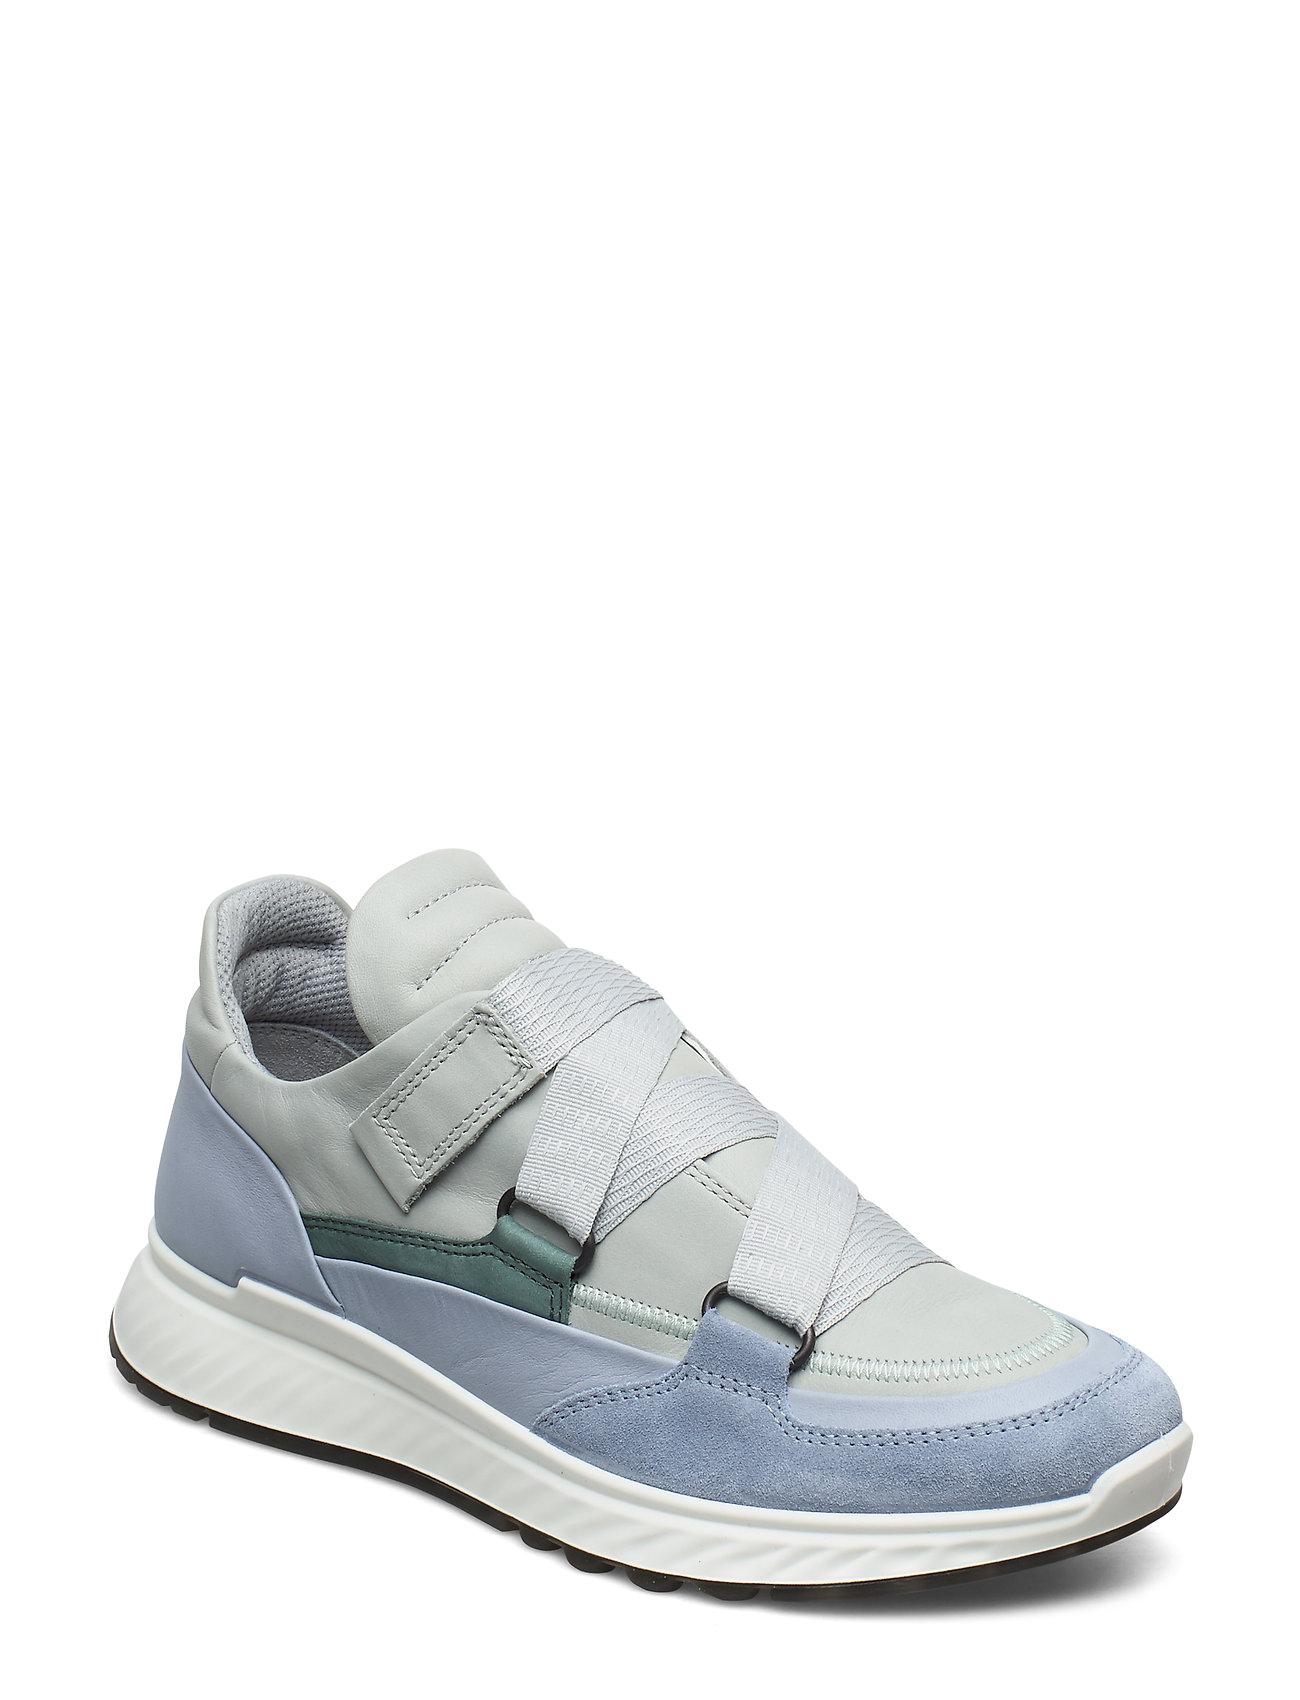 Image of St.1 W Sneakers Blå ECCO (3308422179)